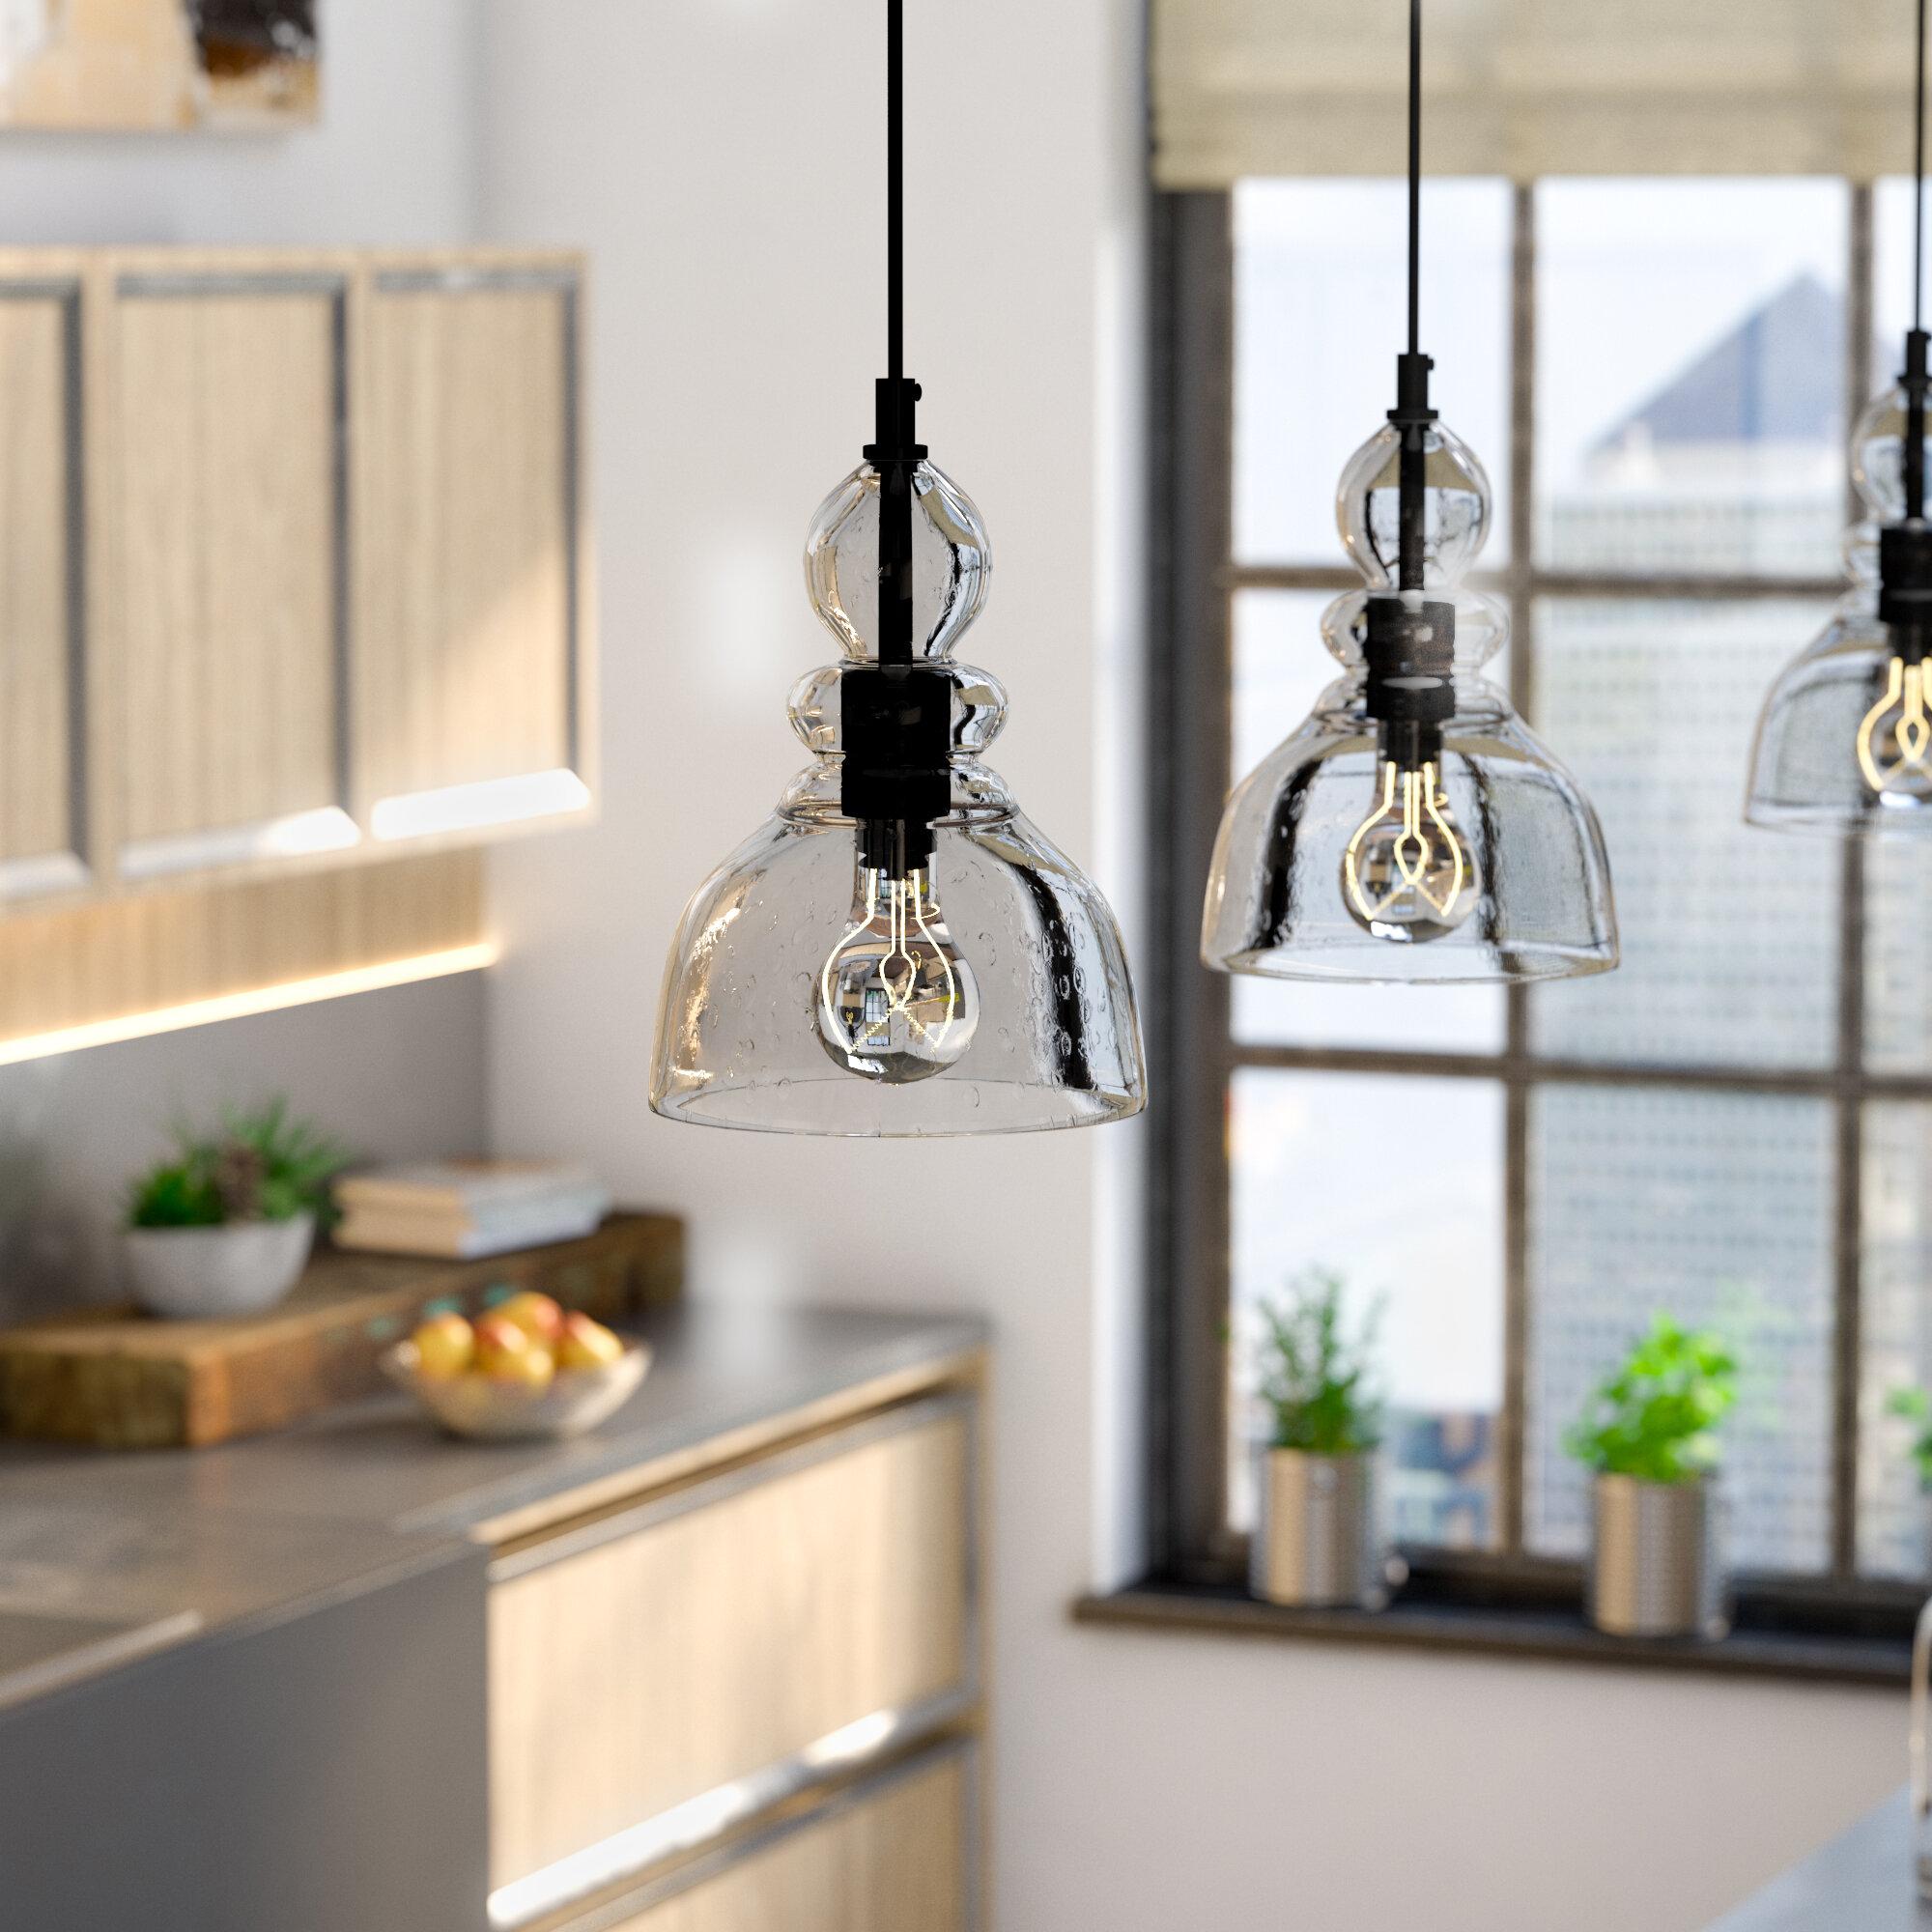 Ebern Designs Yarger 1 Light Single Dome Pendant Reviews Wayfair